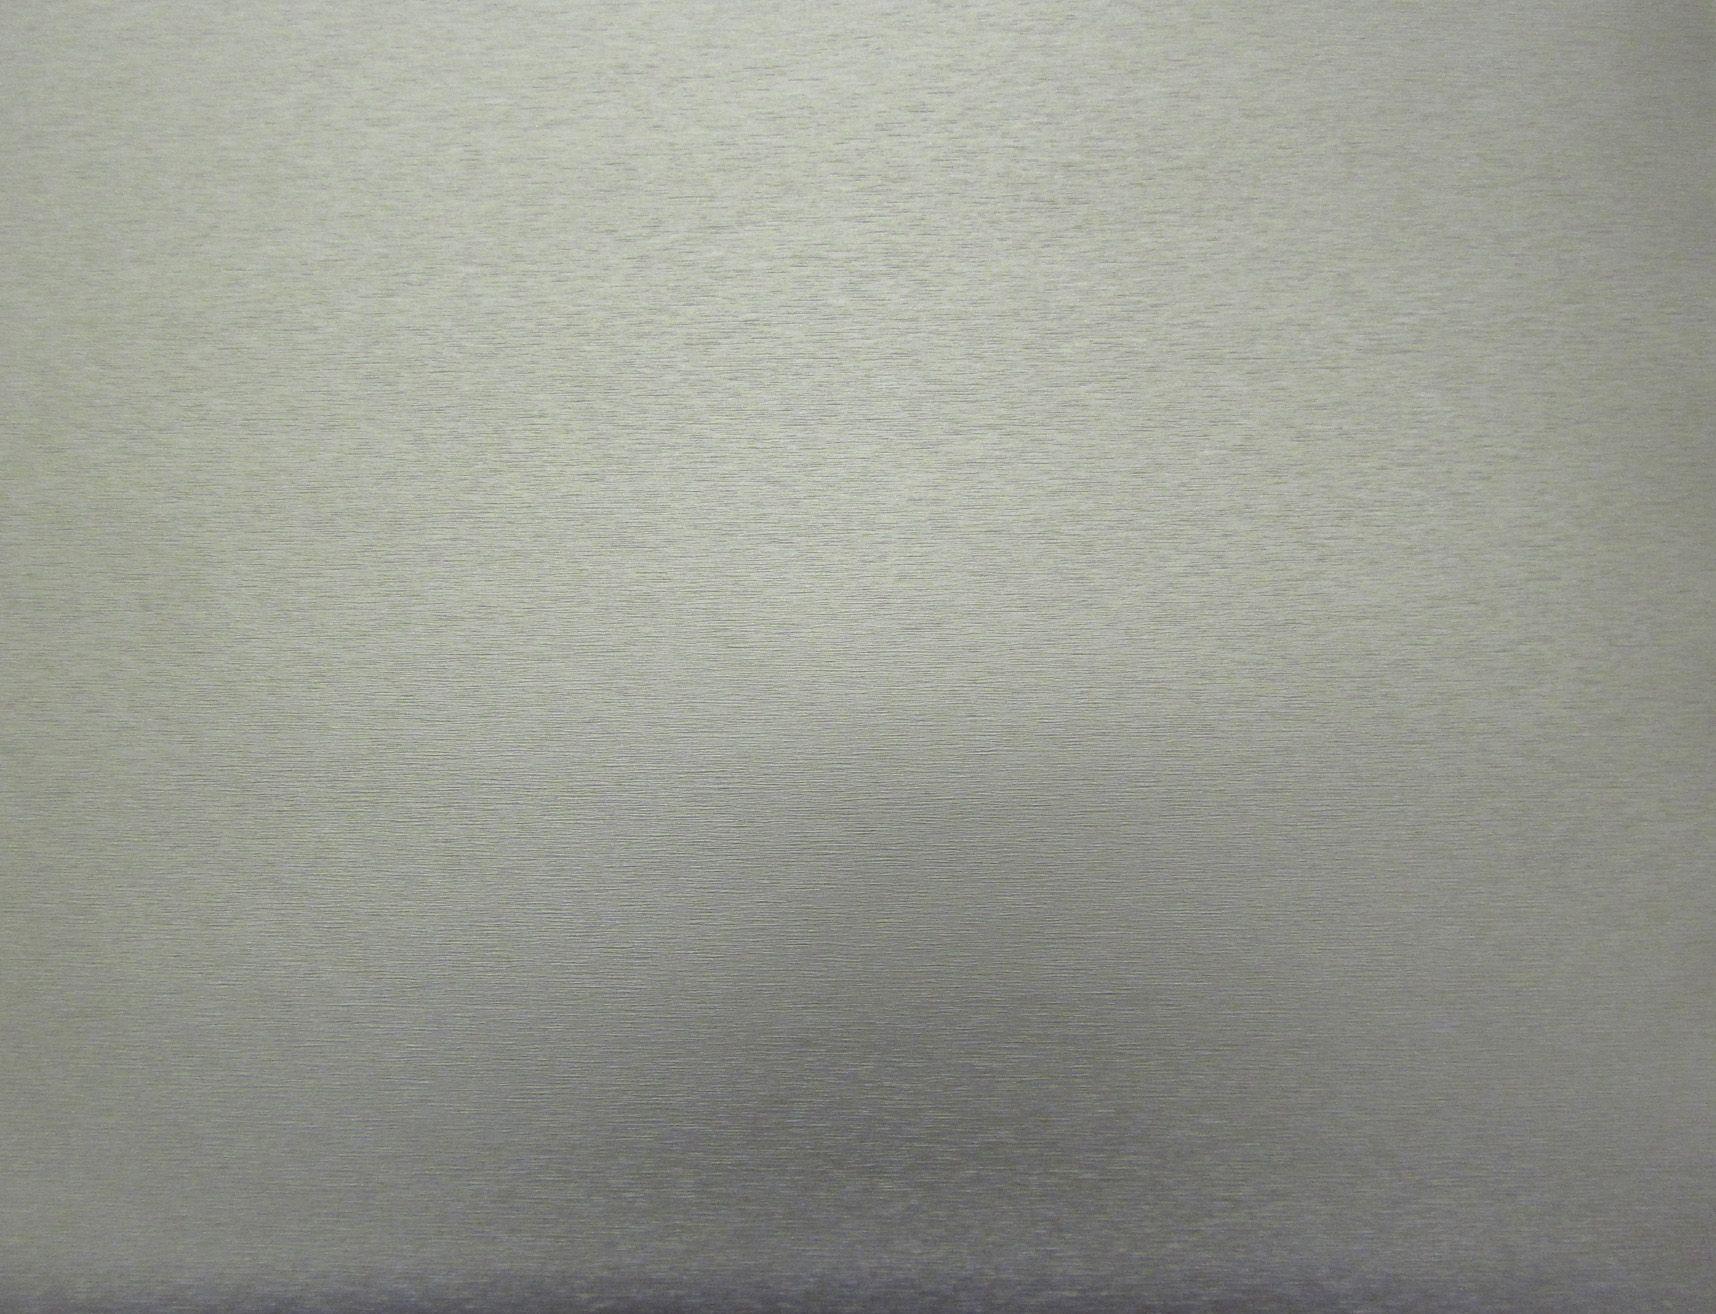 Brushed Aluminum Wallpapers 1716x1314